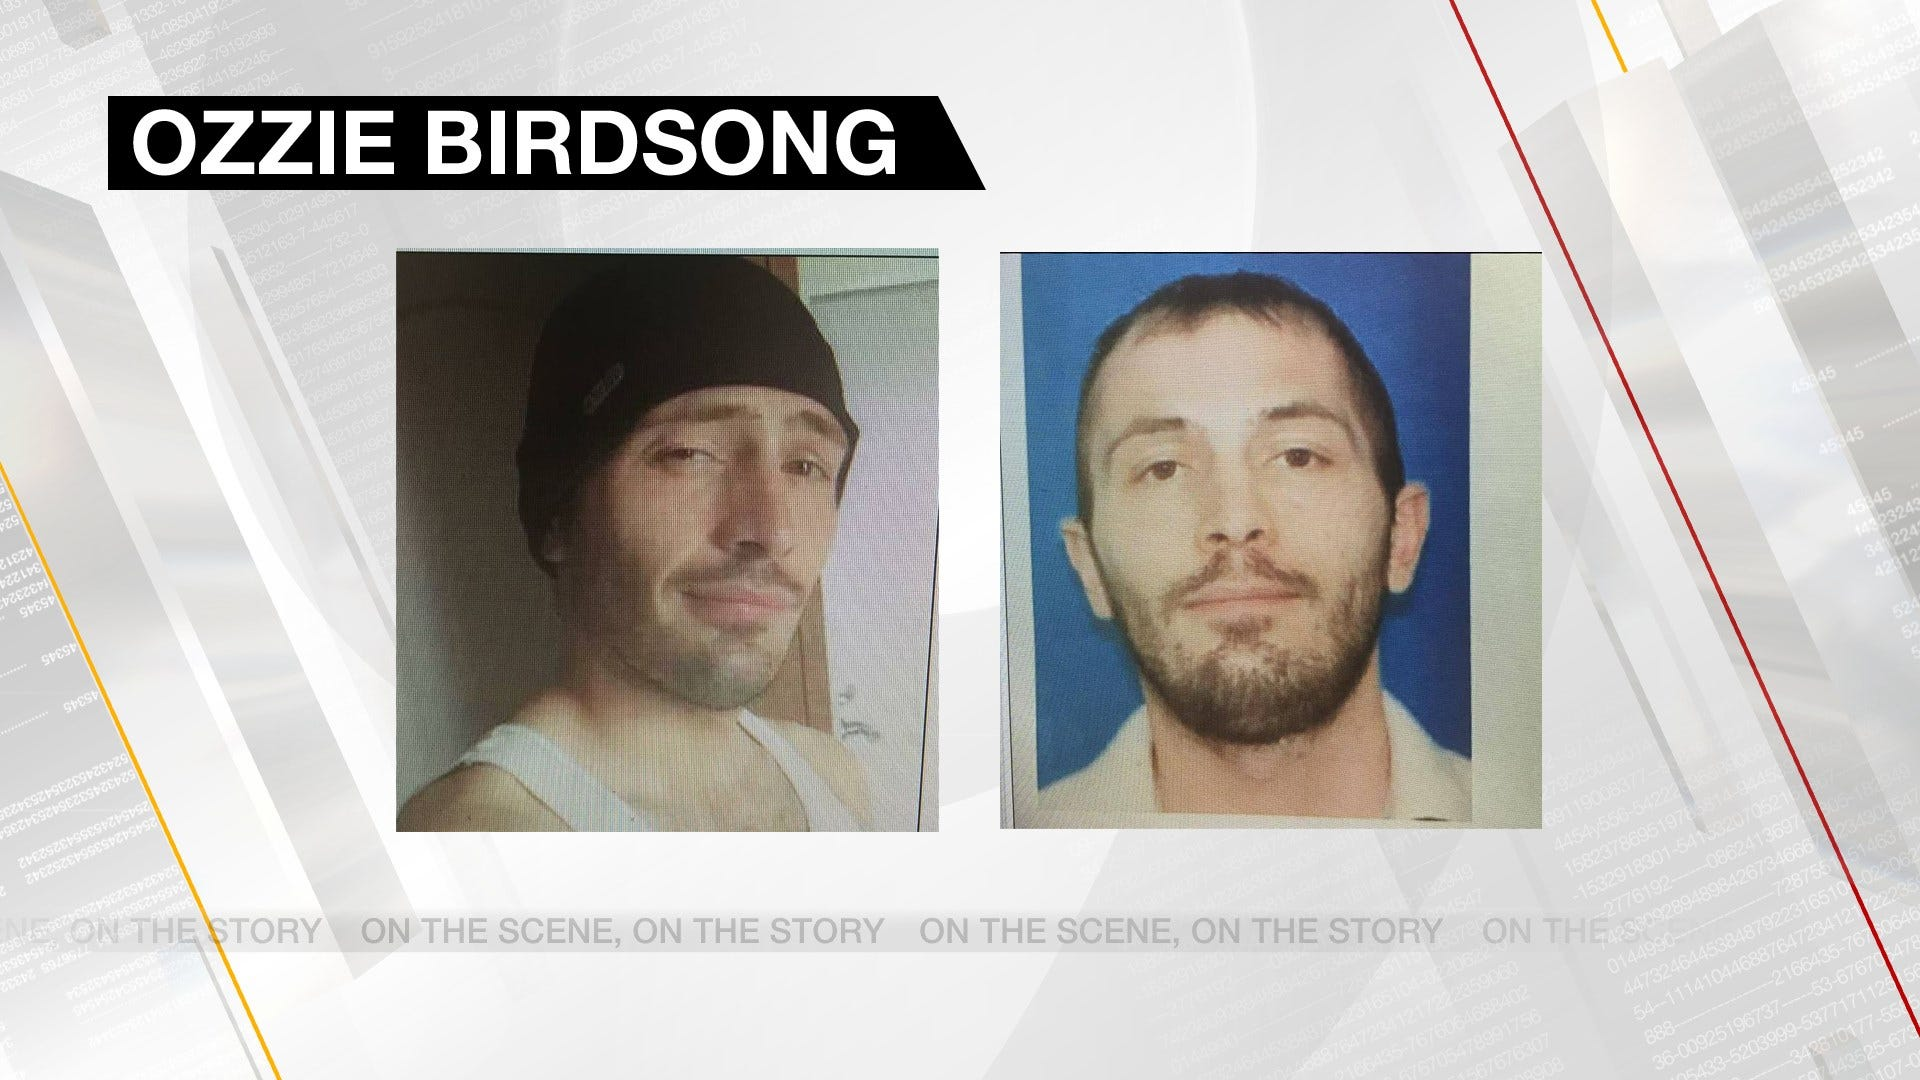 South Dakota Stolen Car Fugitive Spotted In Waukomis